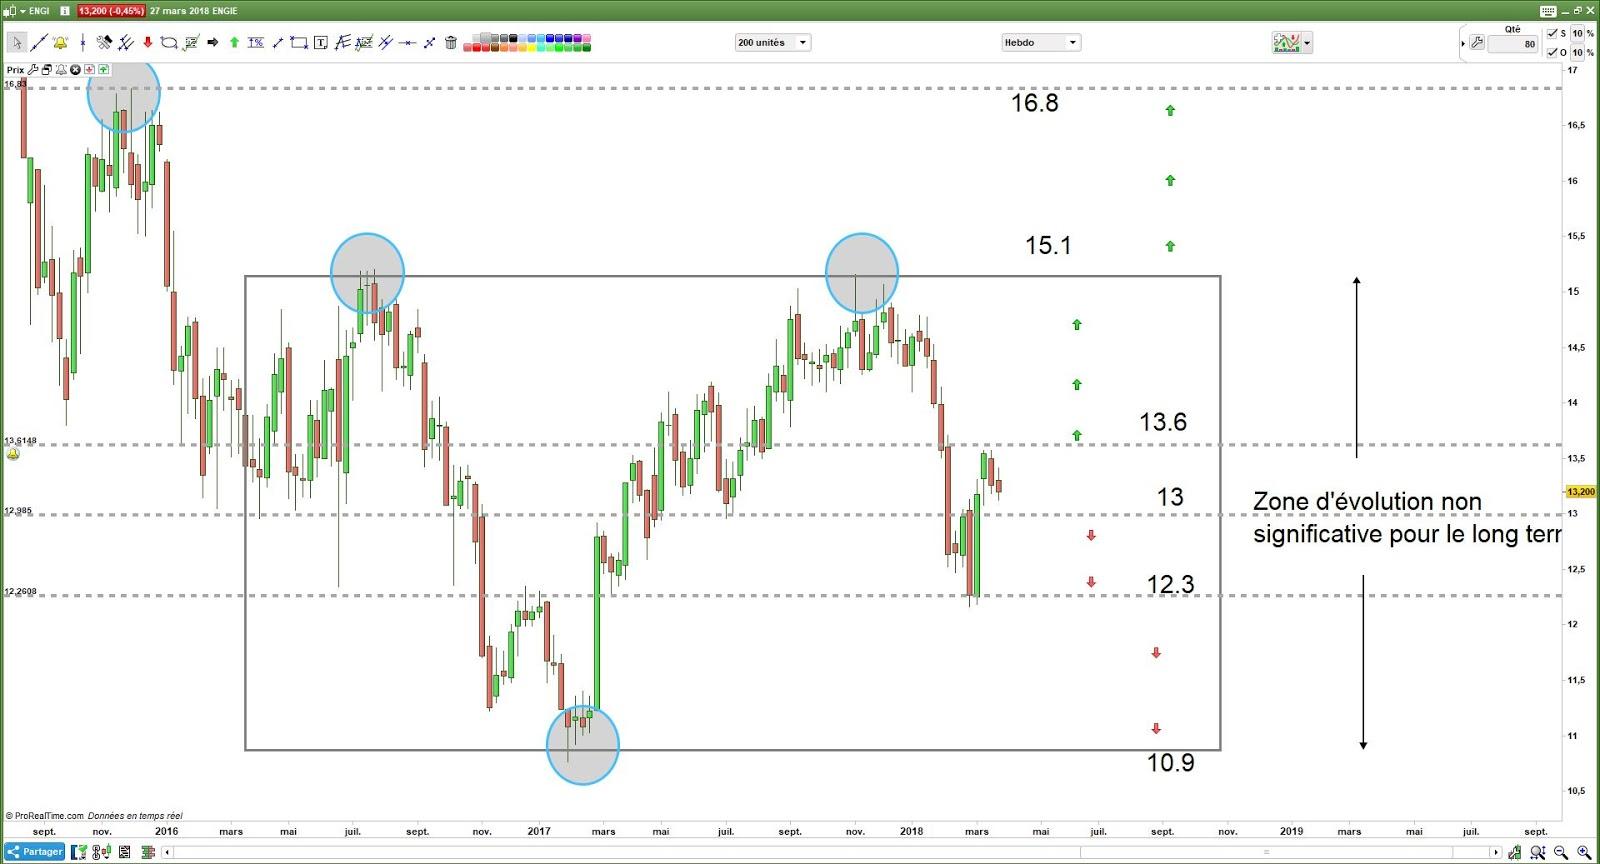 Strategies de trading a court terme